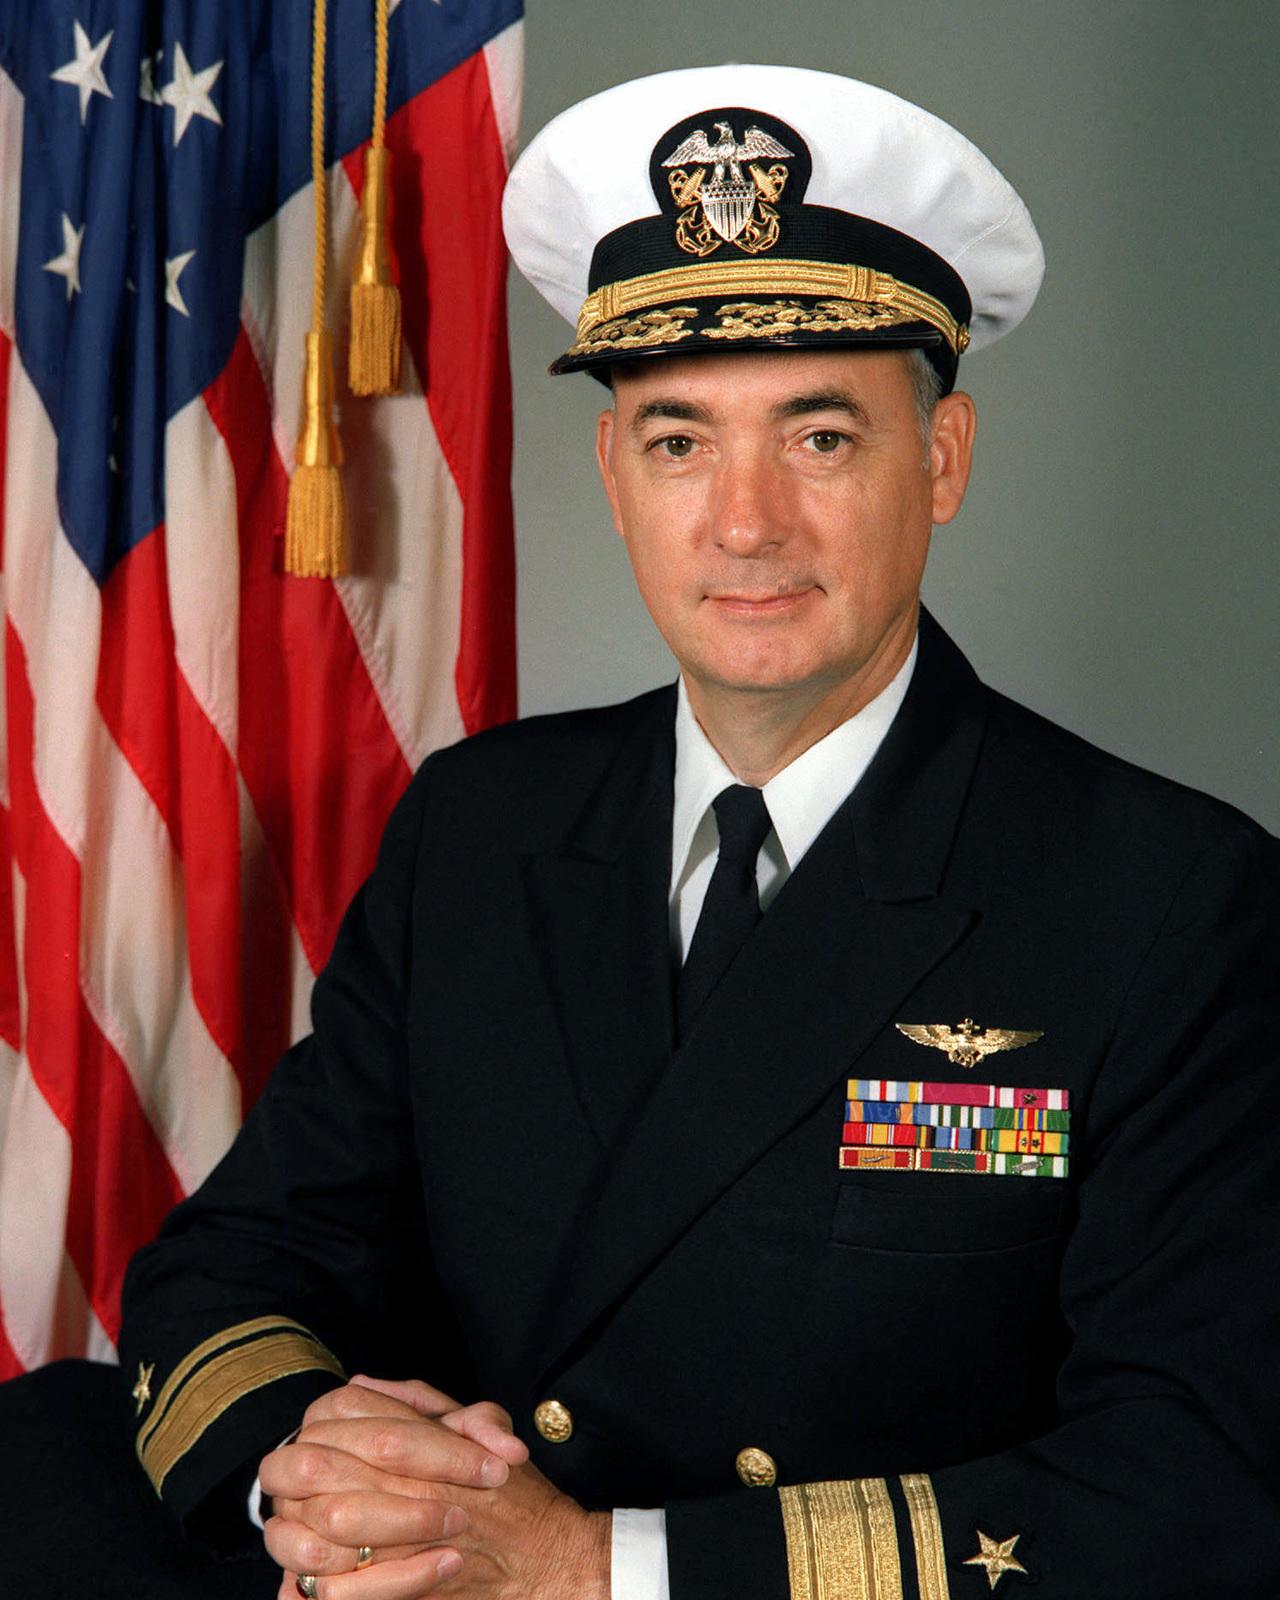 RADM (upper half) Ronald E. Narmi, USN (covered)